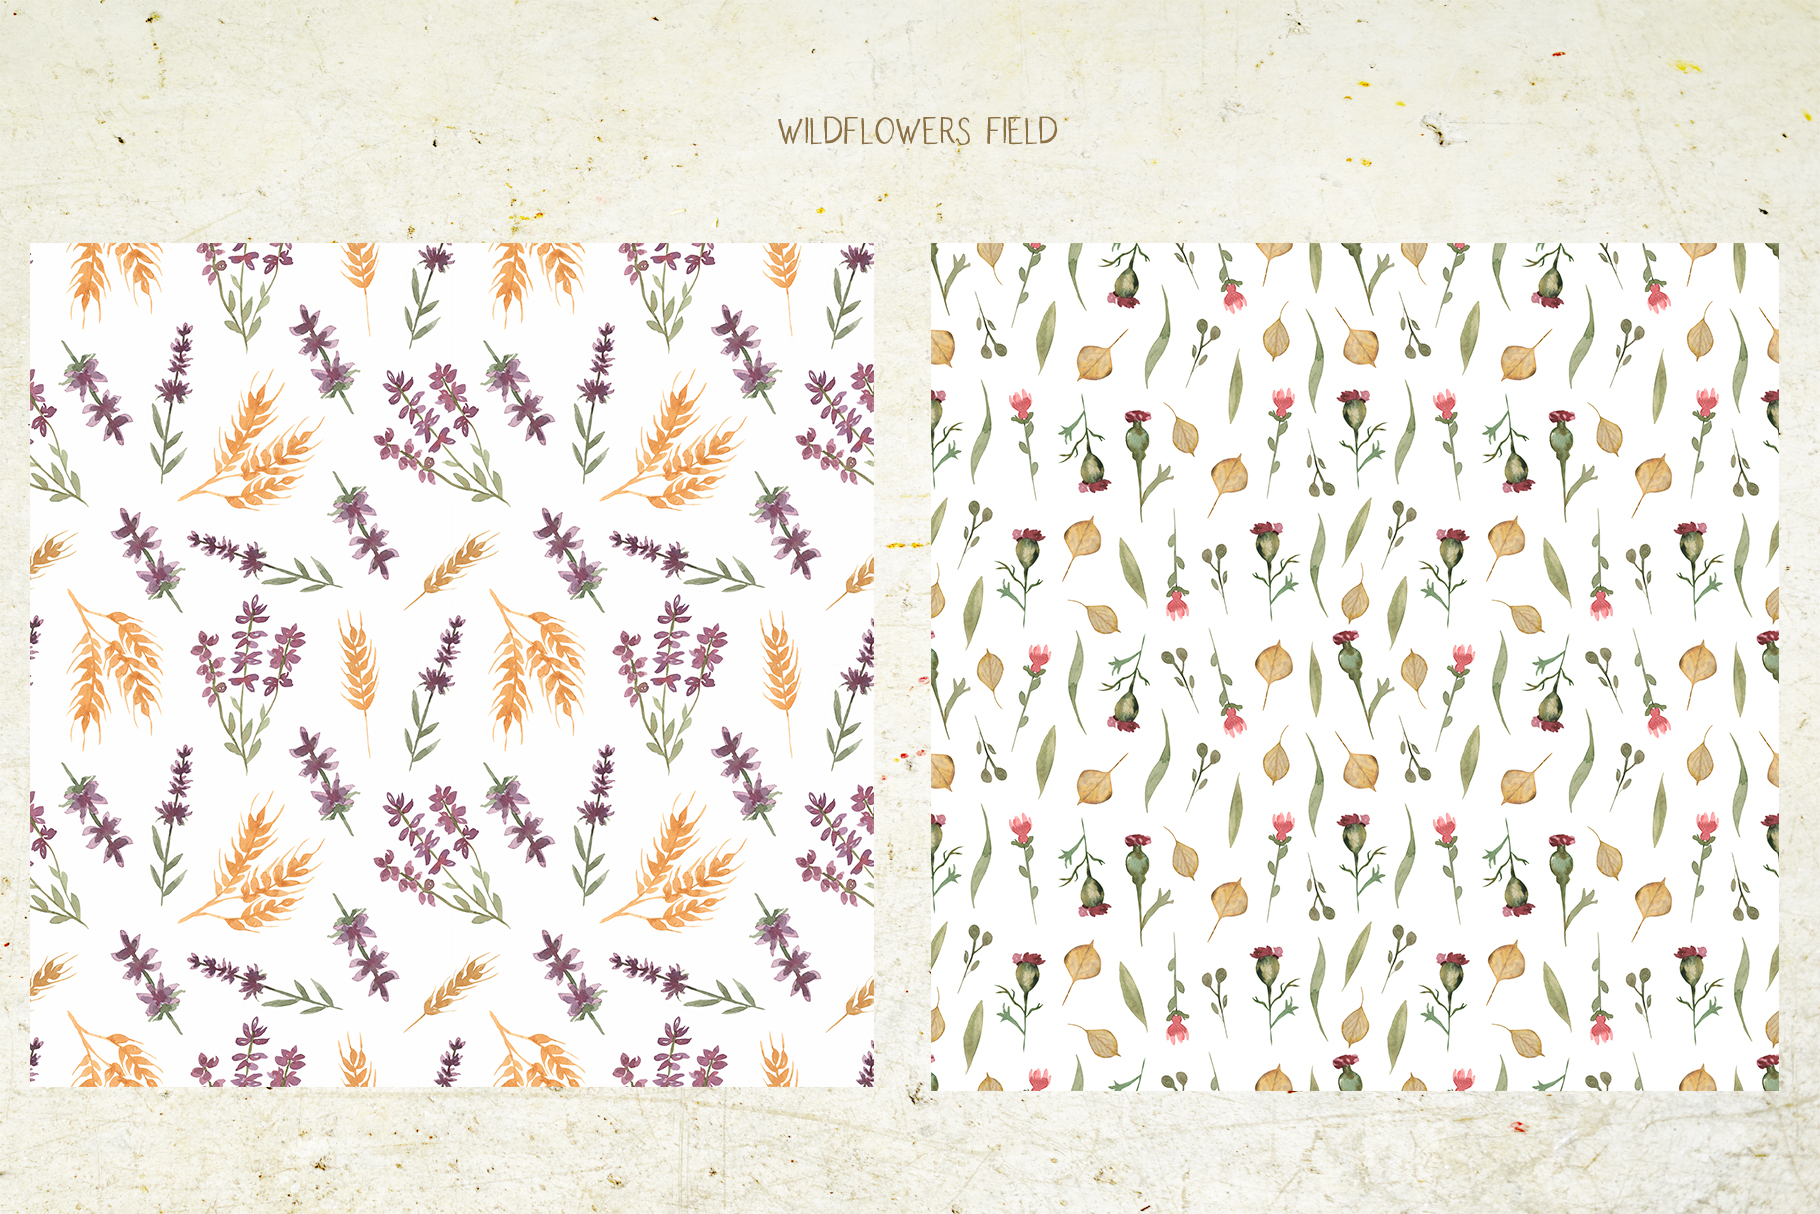 Wildflowers field example image 7